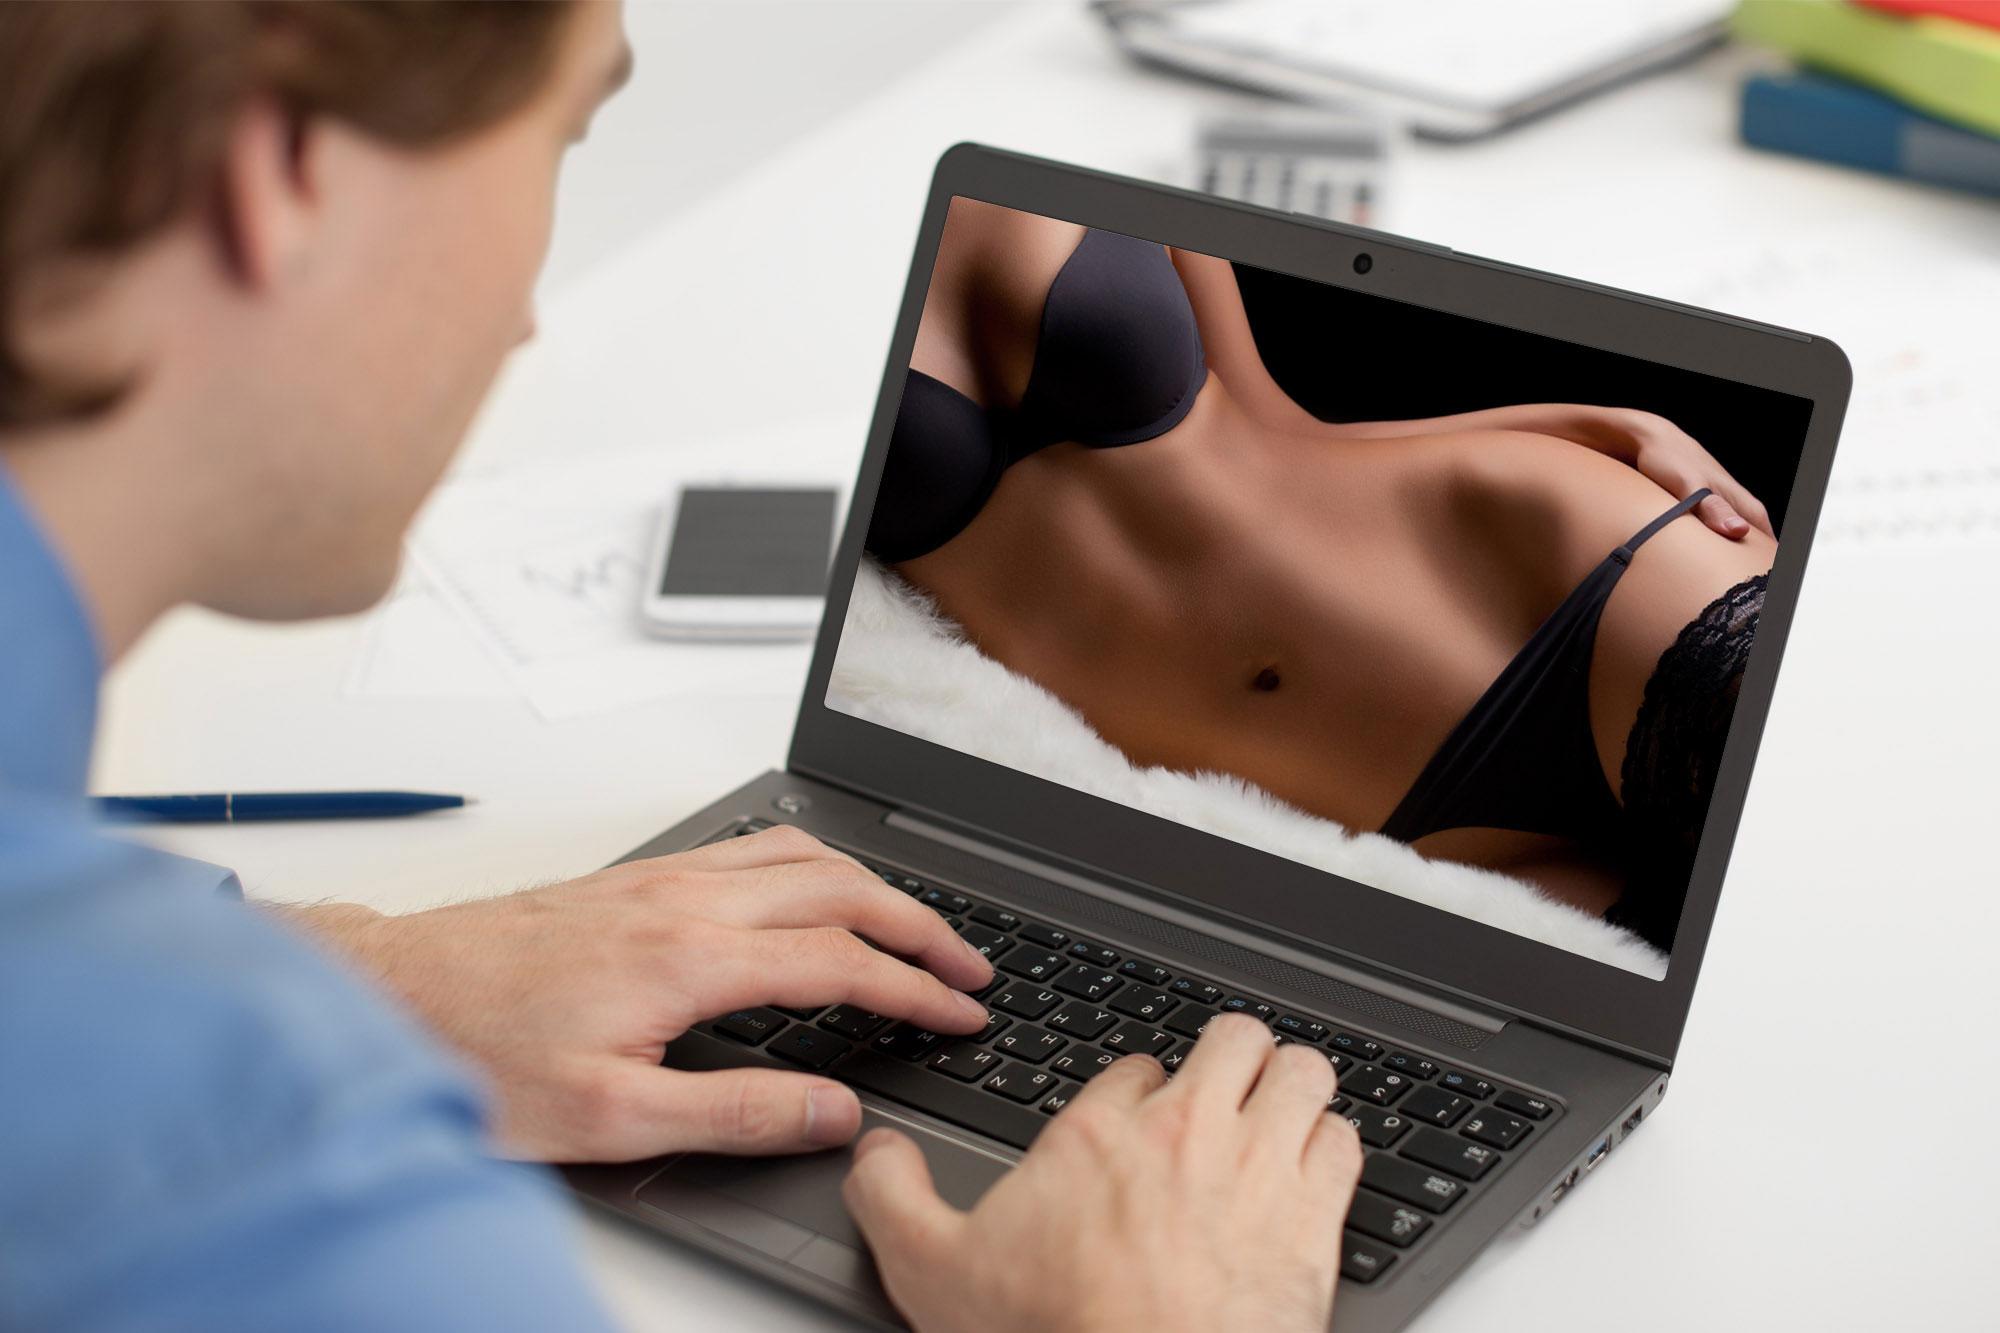 Occupation of internet sex